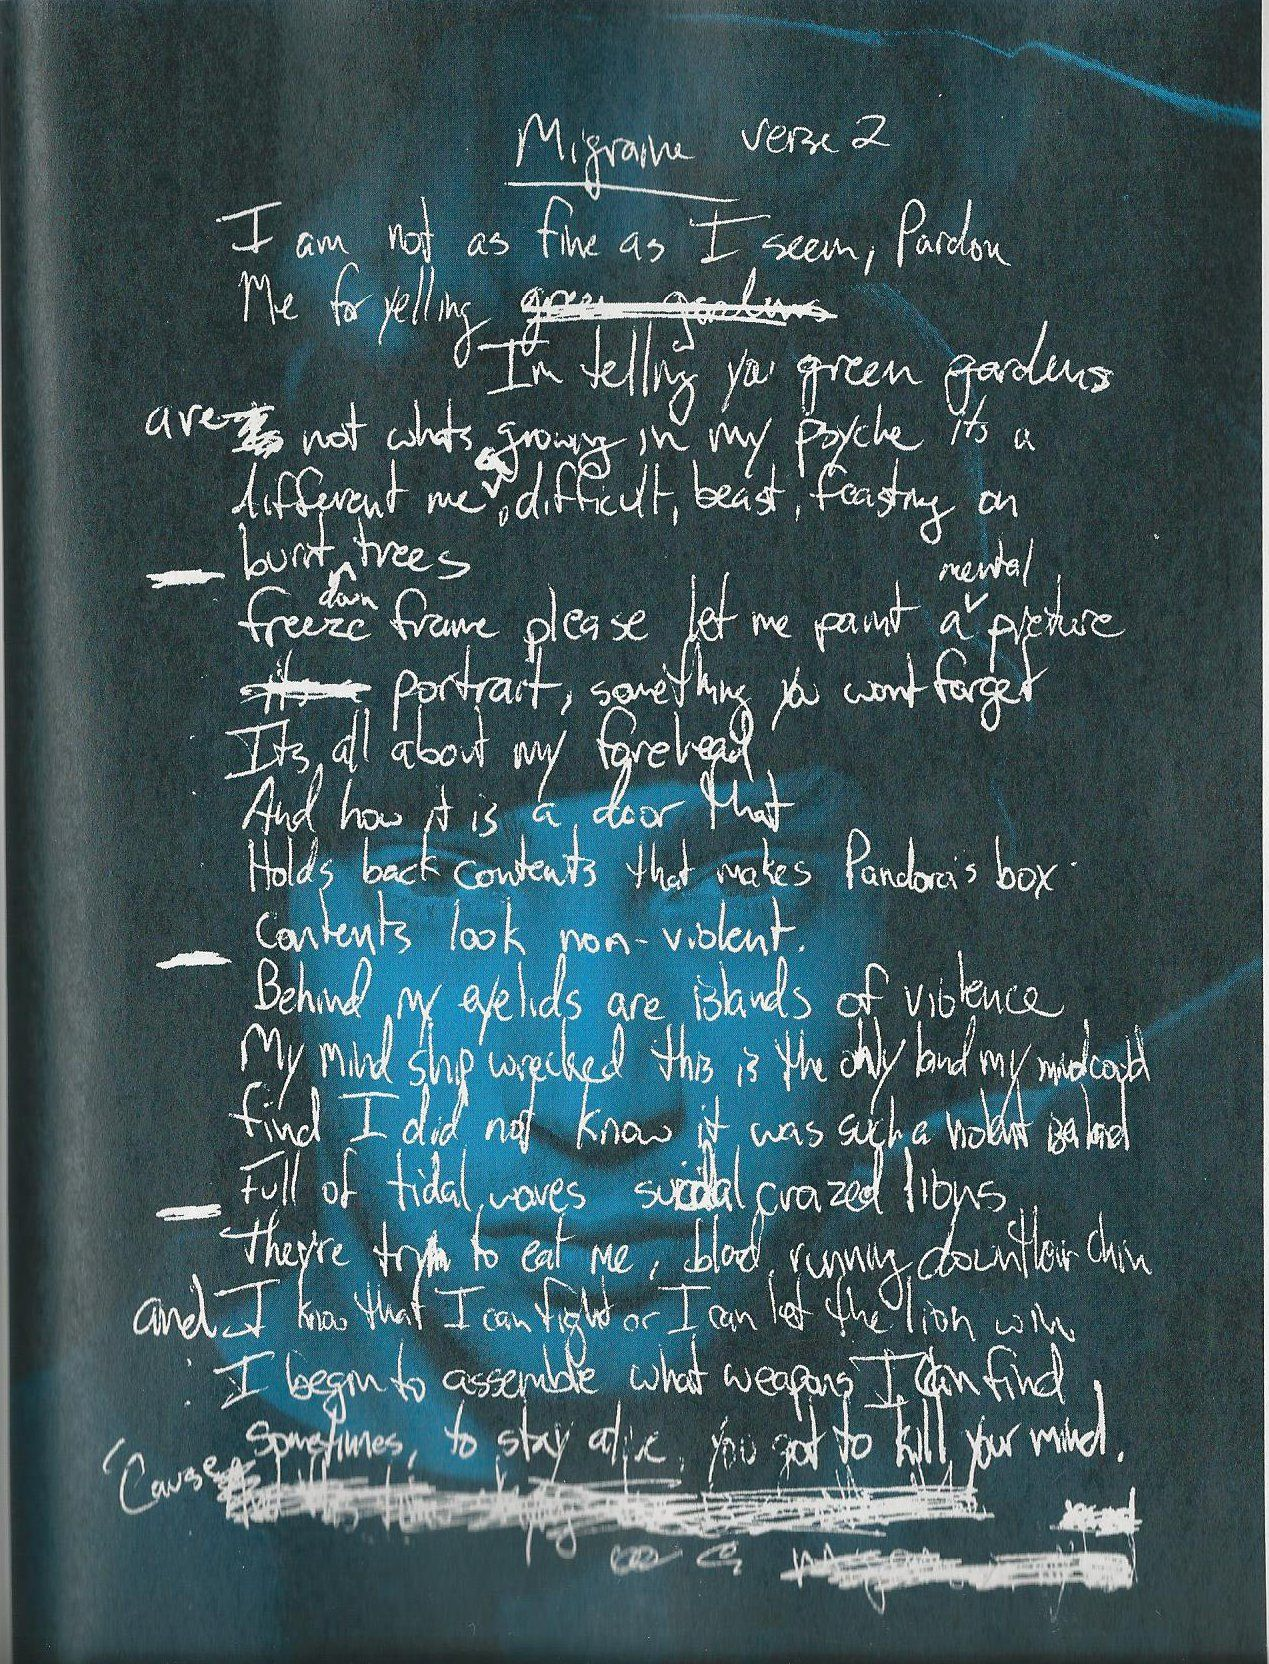 migraine handwritten lyrics twenty à ne pilà ts pinterest migraine